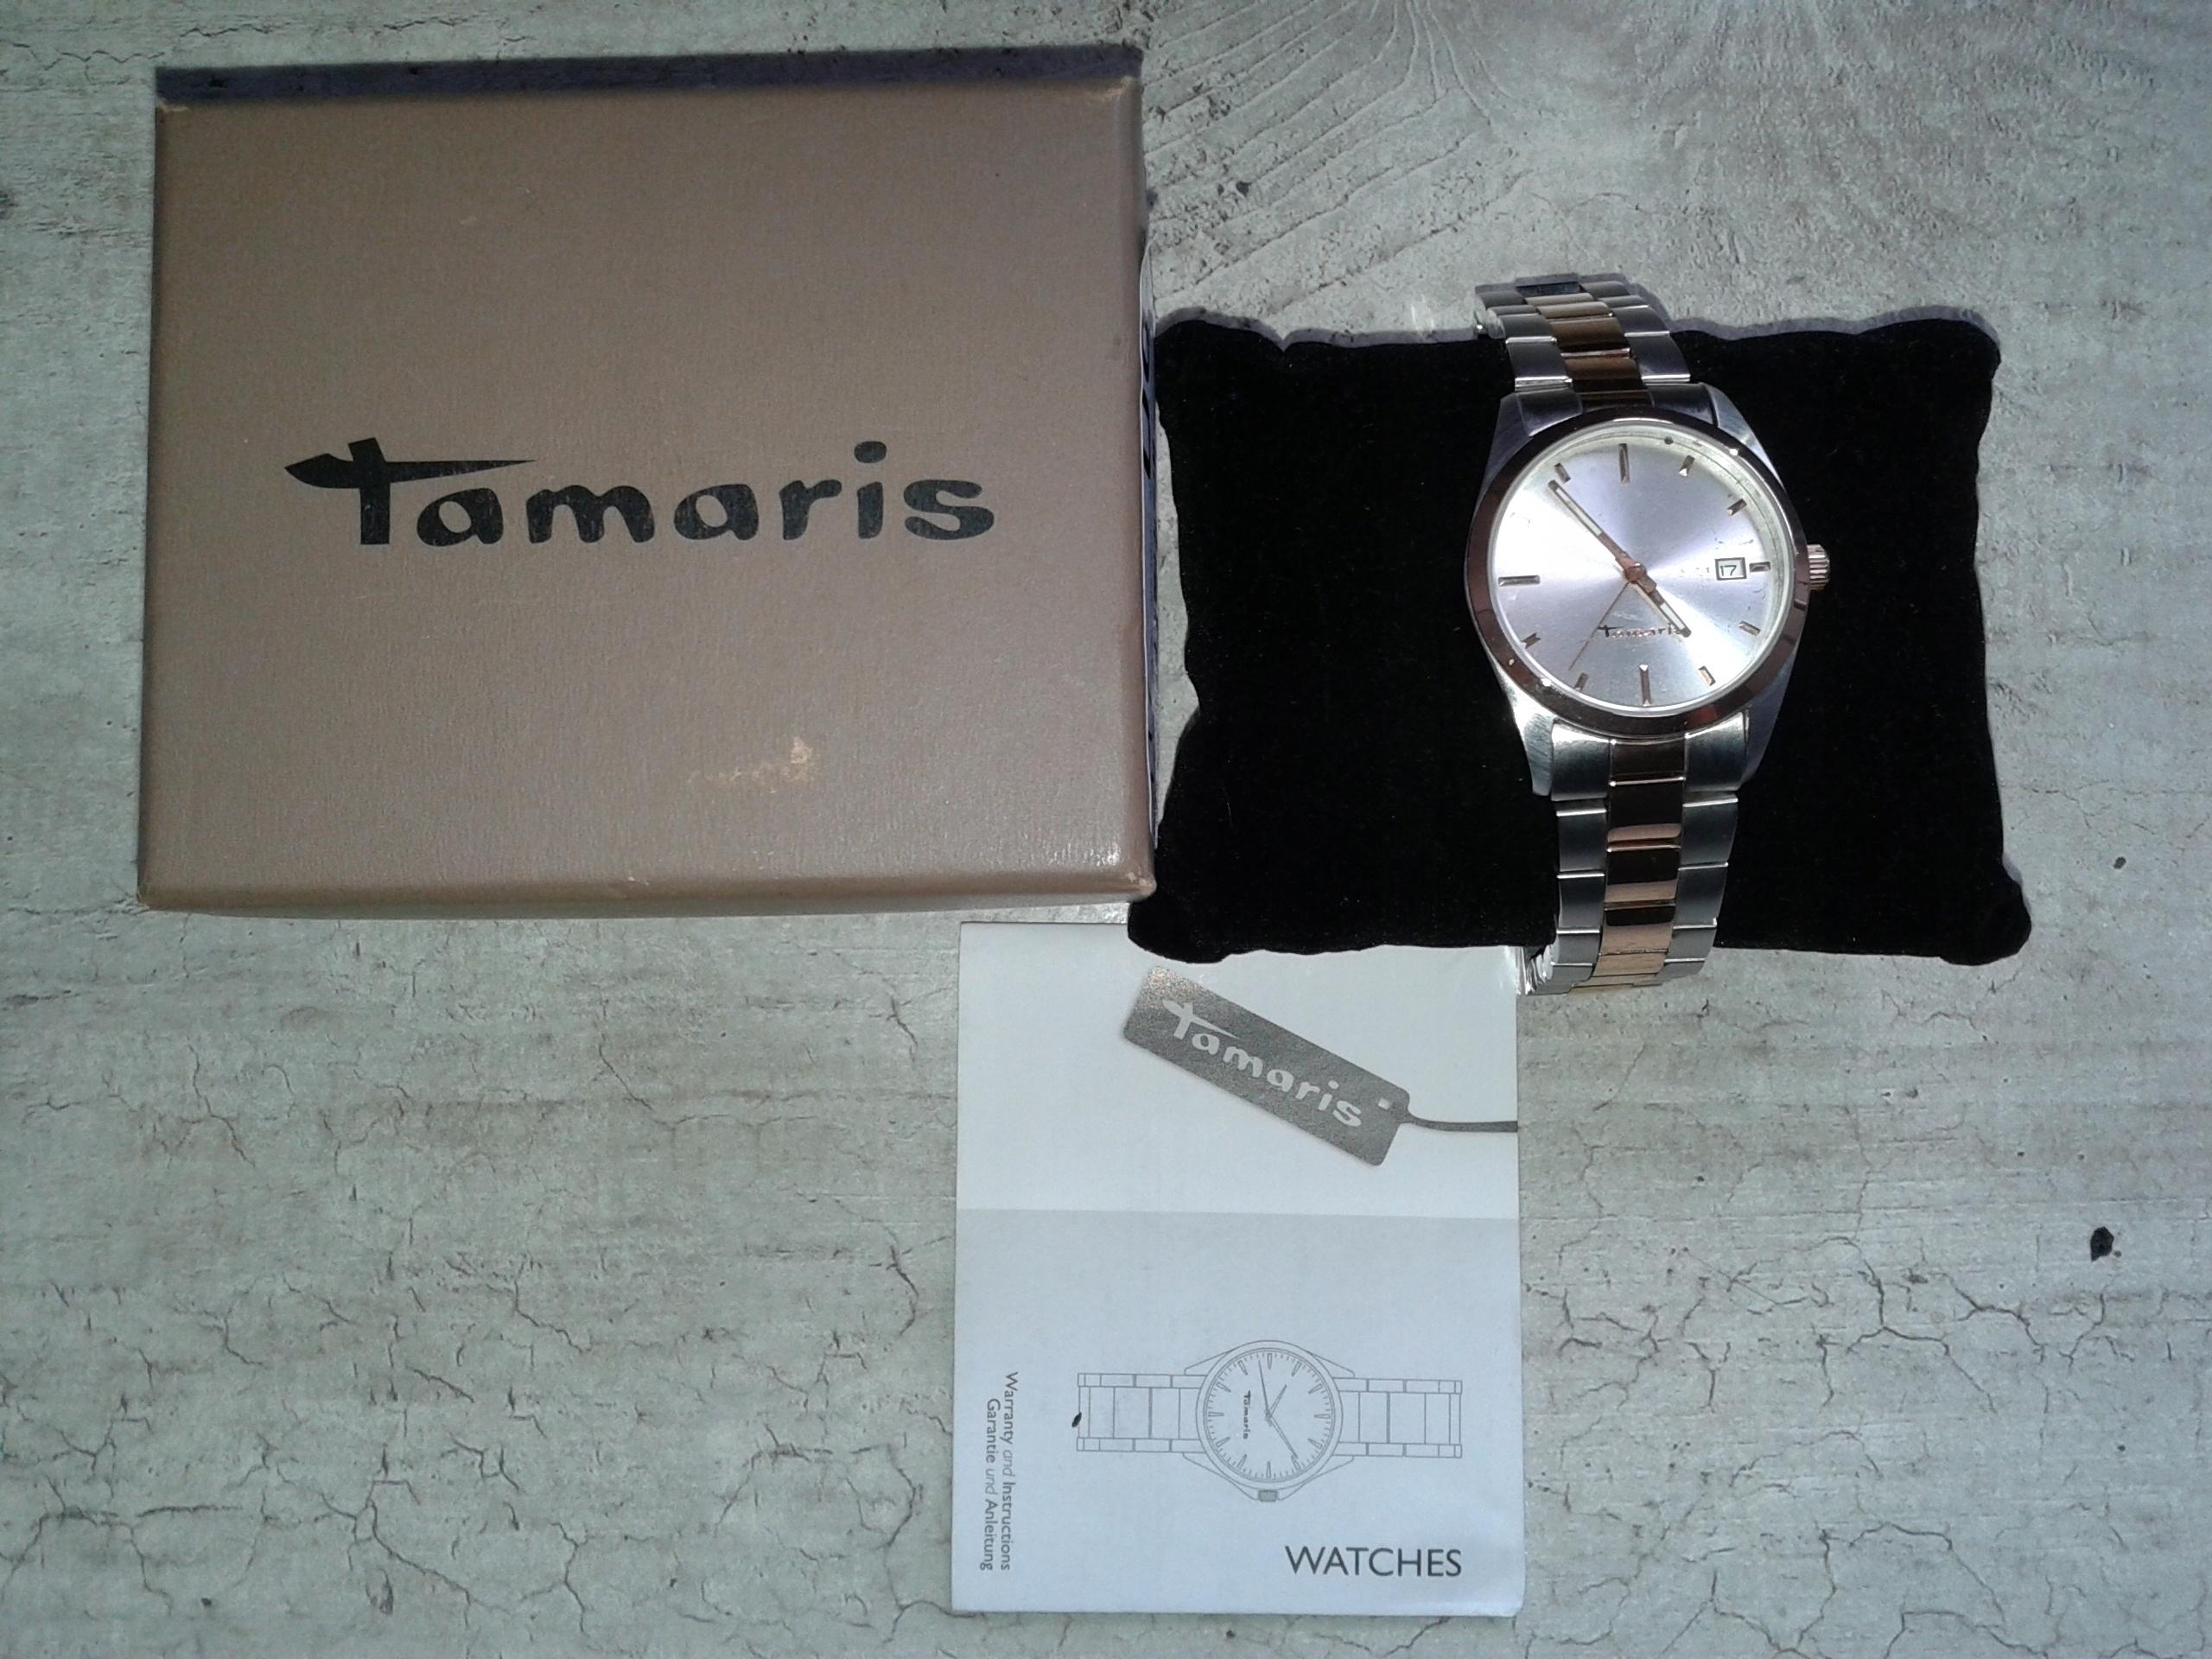 Zegarek Tamaris złoto różowe a'la 'Roleksio'